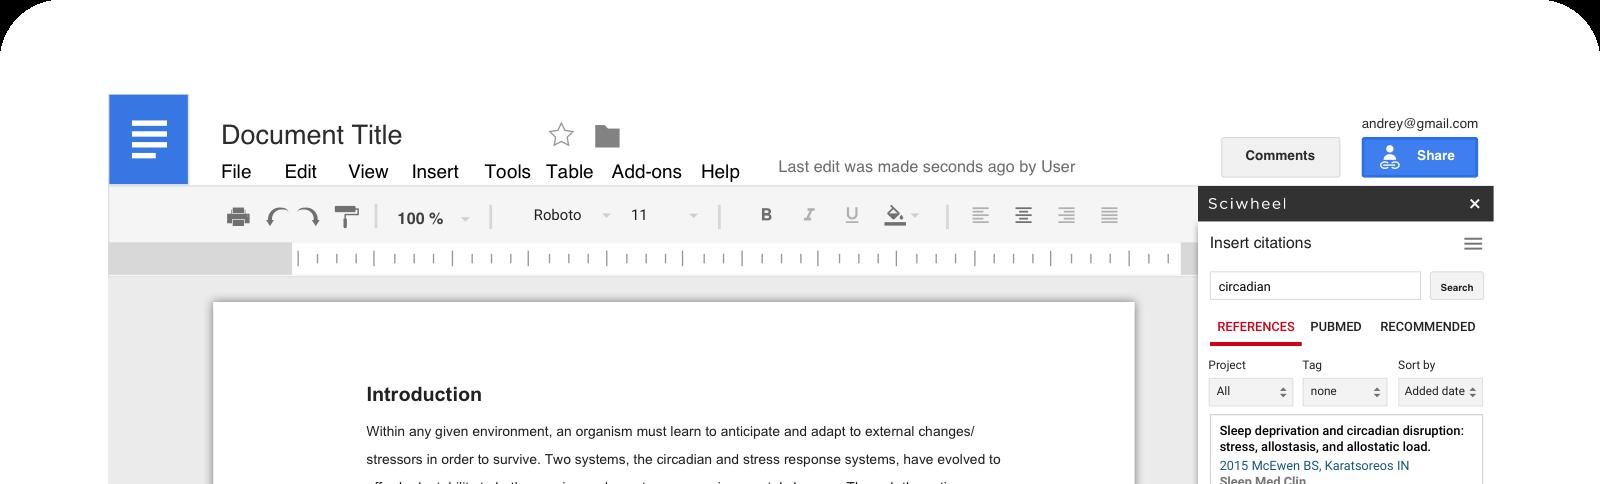 harvard referencing tool online